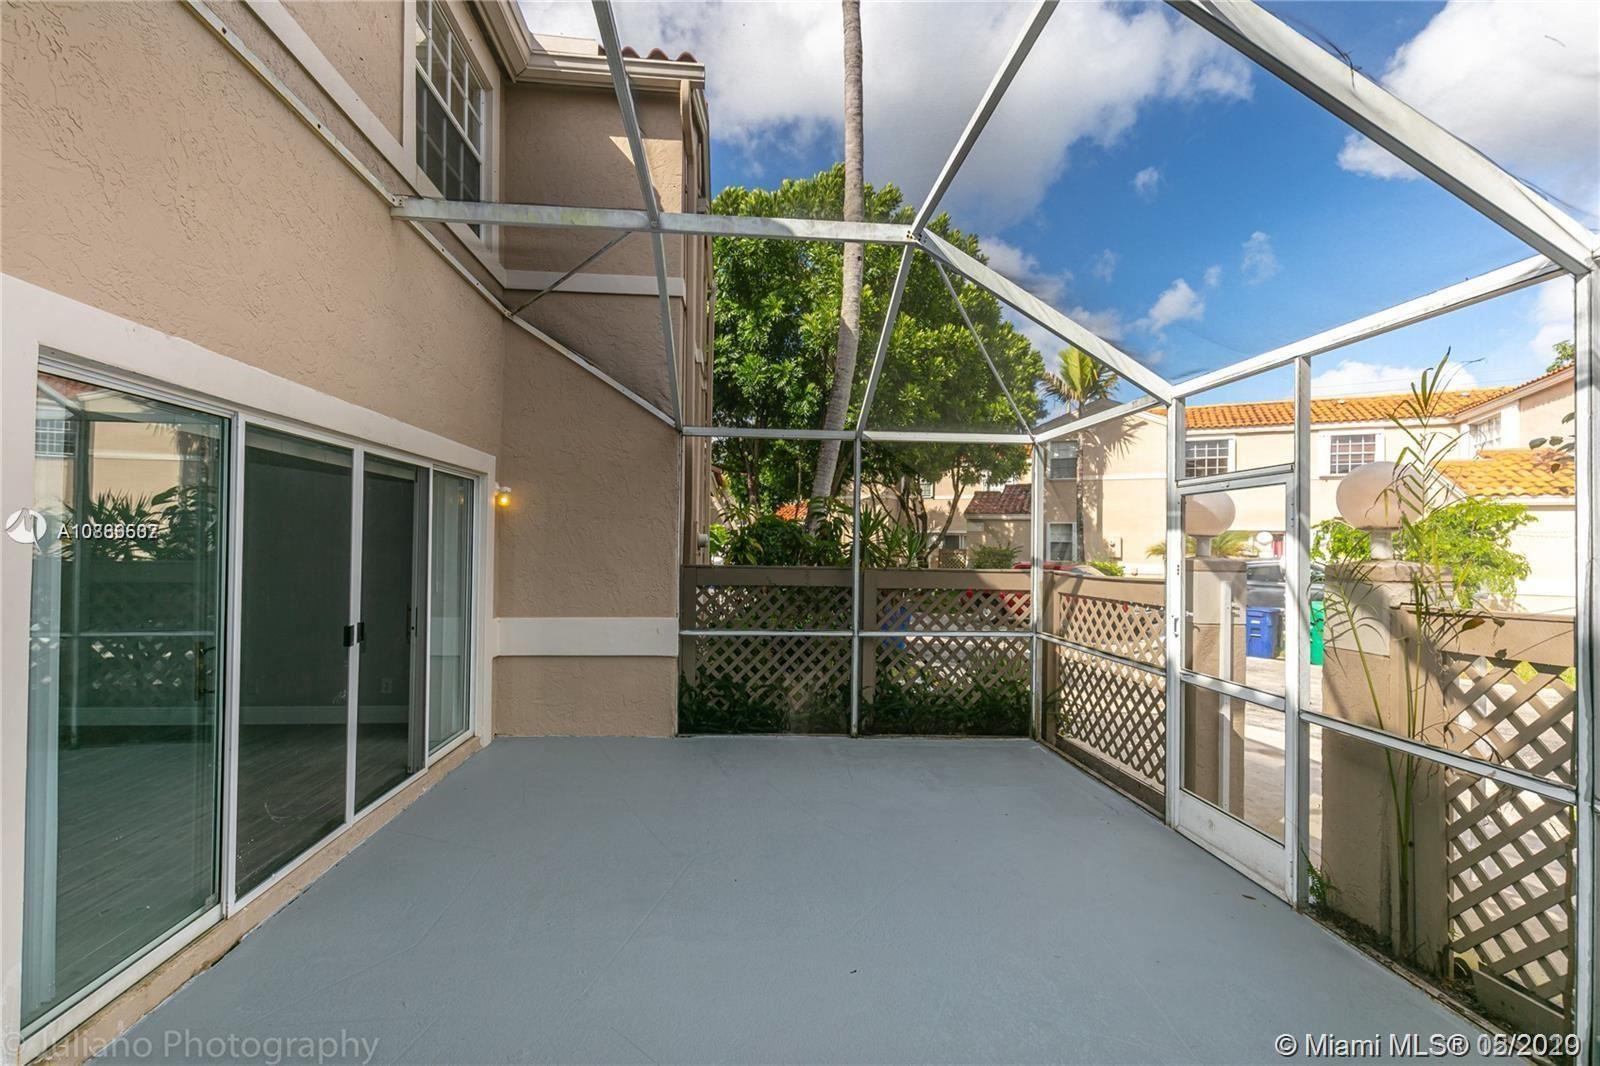 Photo of 10978 Mainsail Dr, Cooper City, FL 33026 (MLS # A10866507)